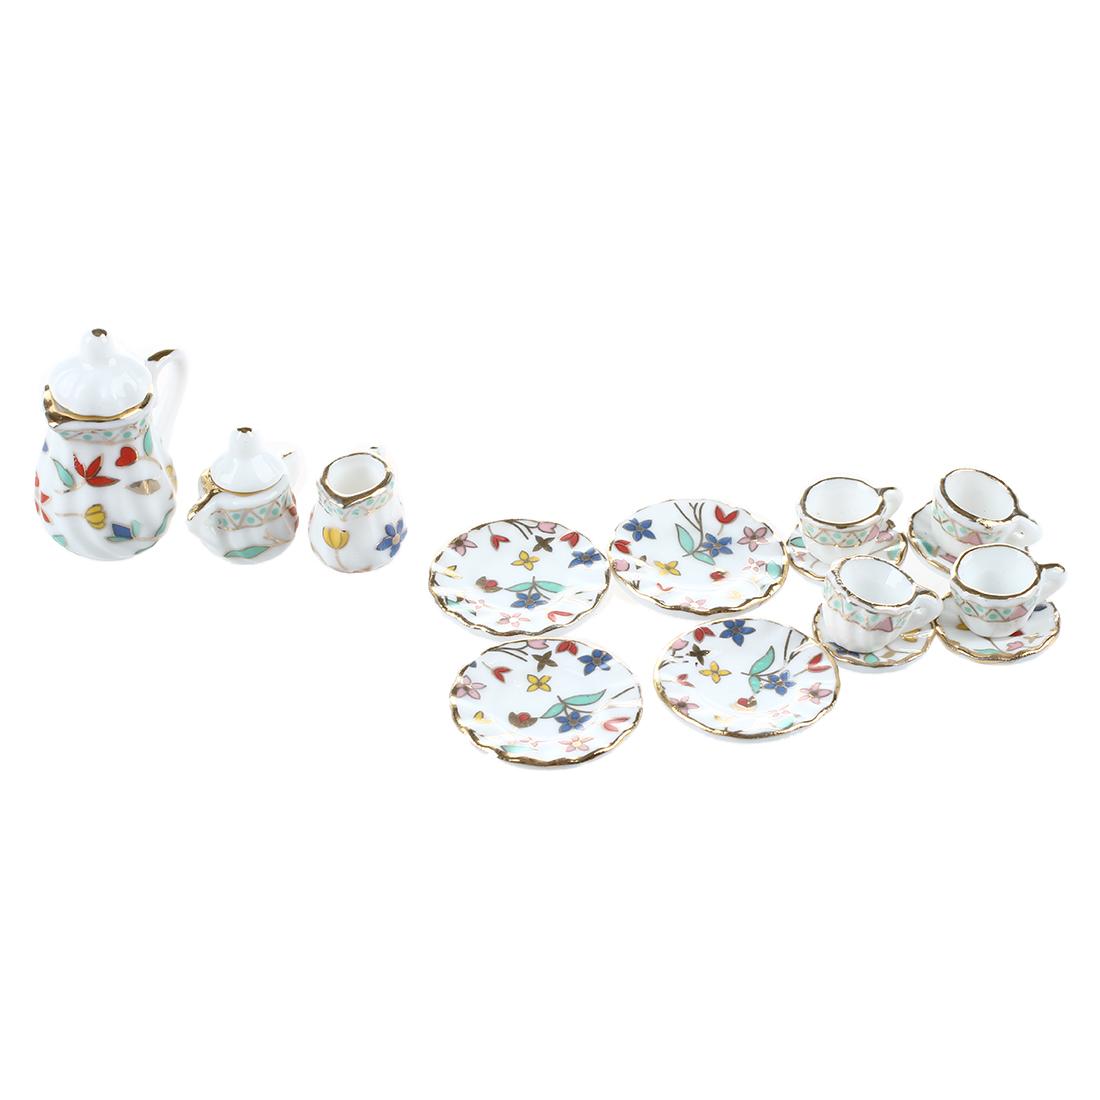 SaLe!! Dollhouse Miniature Blue Band and Floral Porcelain Dinner Set